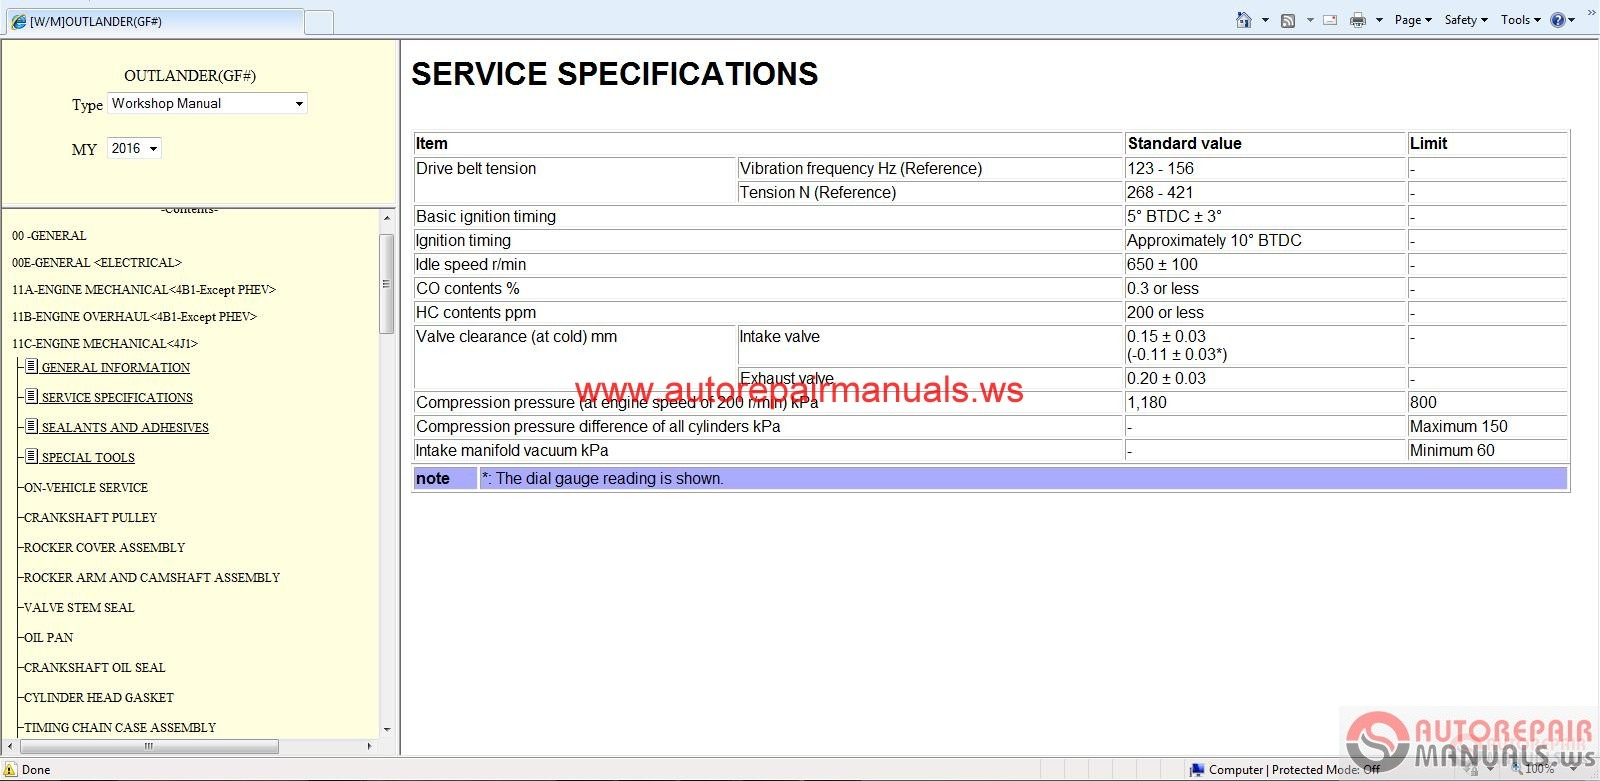 Mitsubishi Outlander Eur 2016 Service Manual Cd